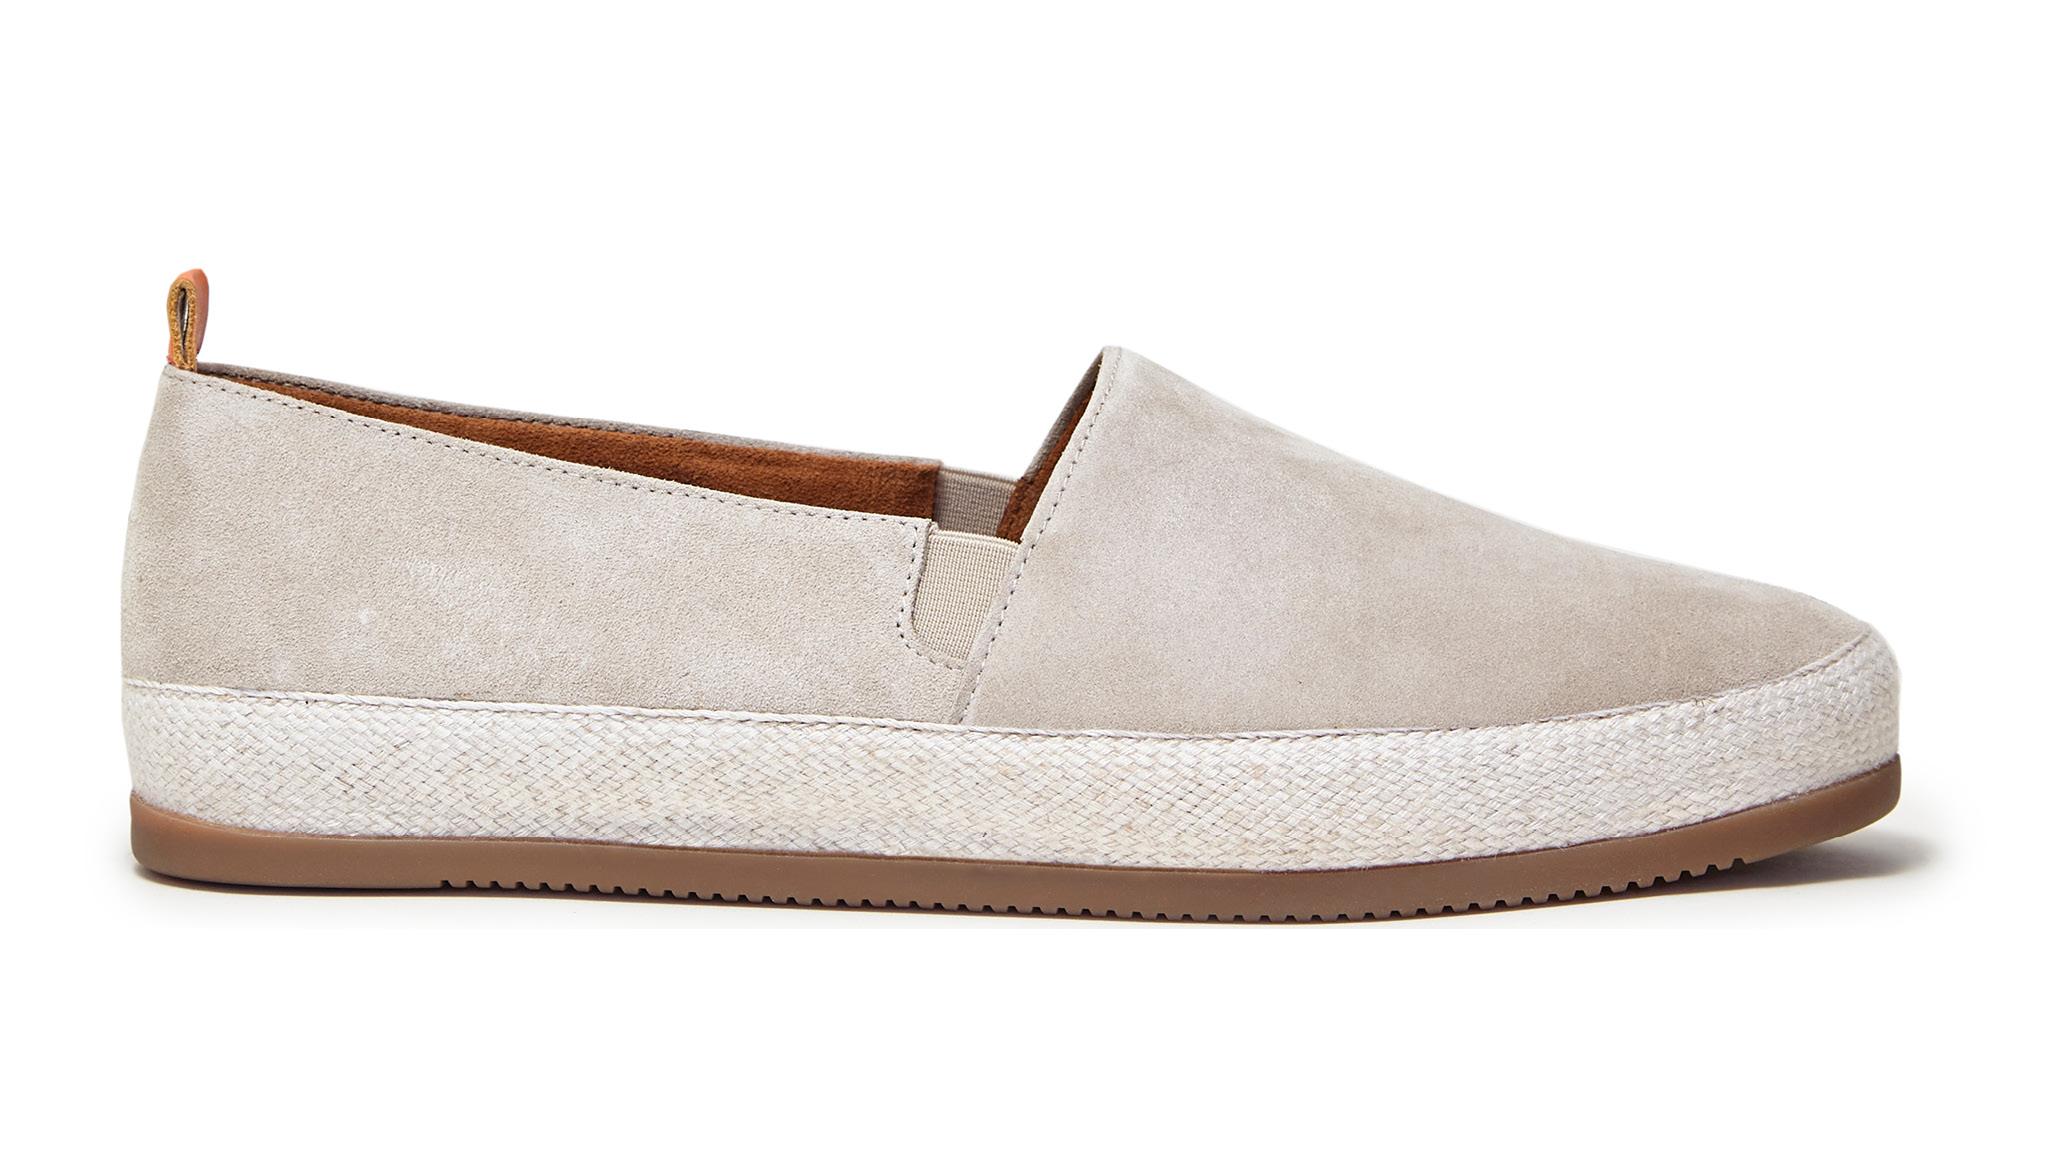 Mens White Espadrilles | MULO shoes